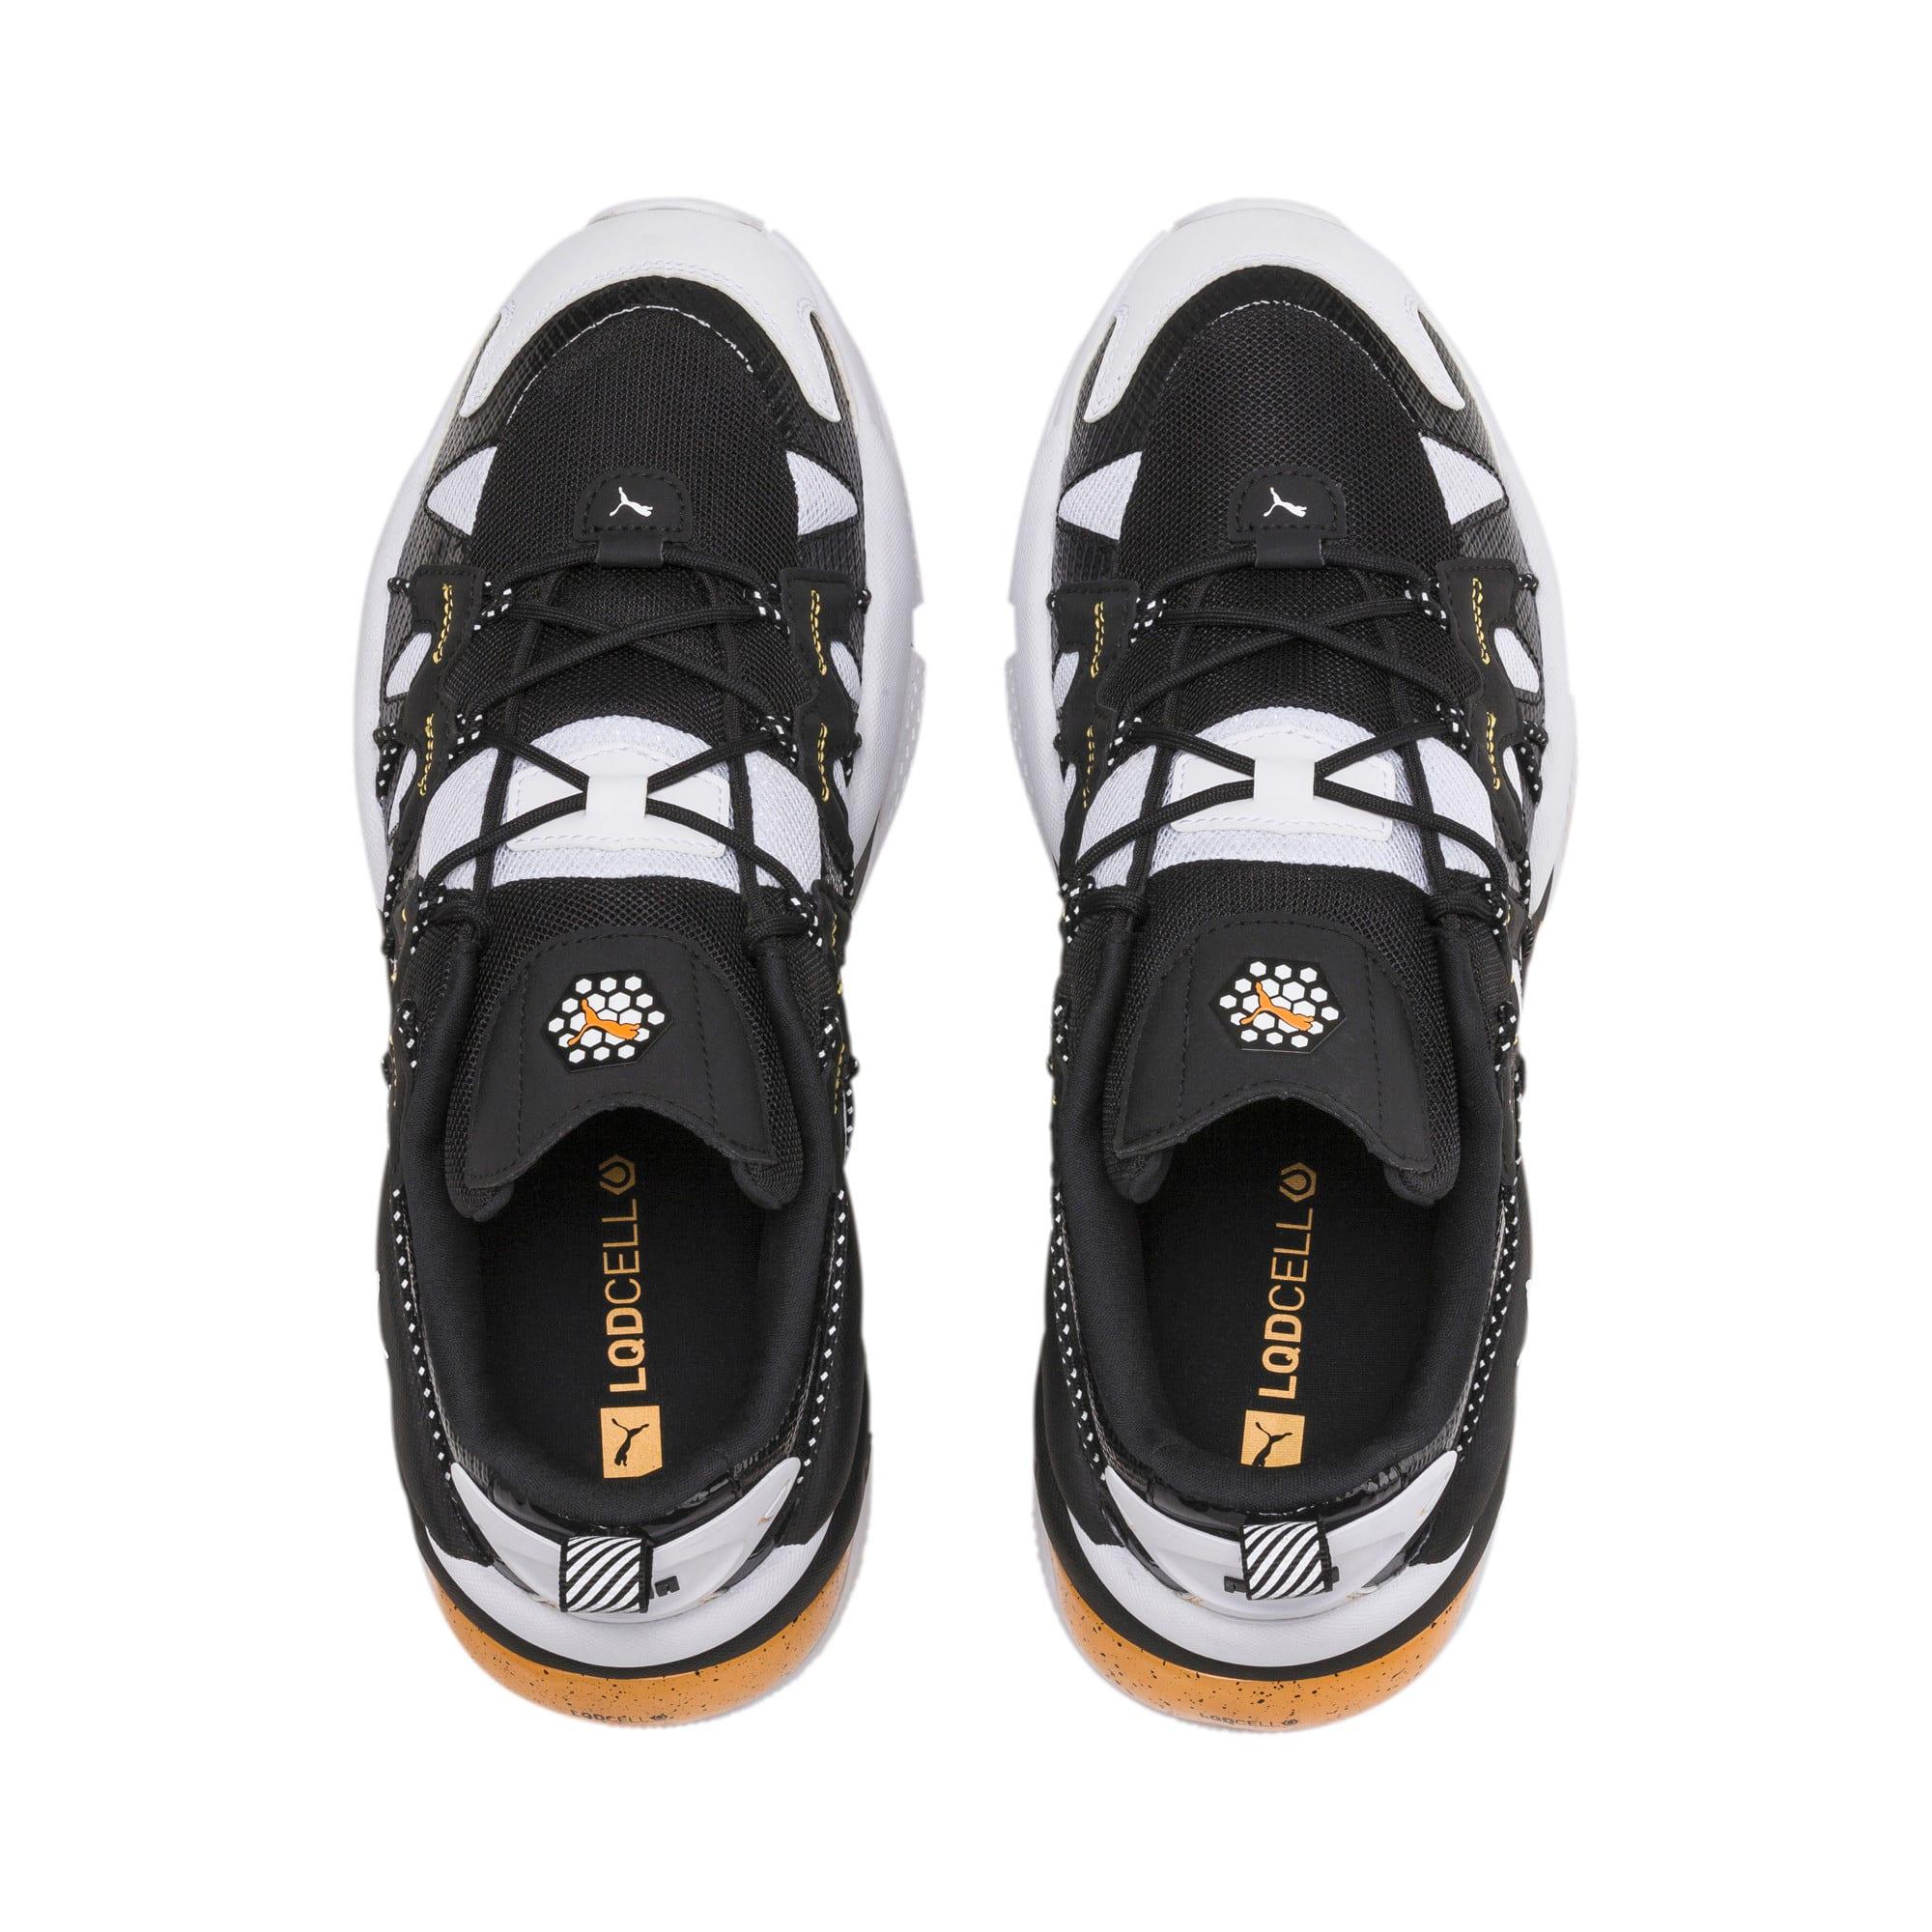 Thumbnail 6 of LQDCELL Omega Density Training Shoes, Puma White-Puma Black, medium